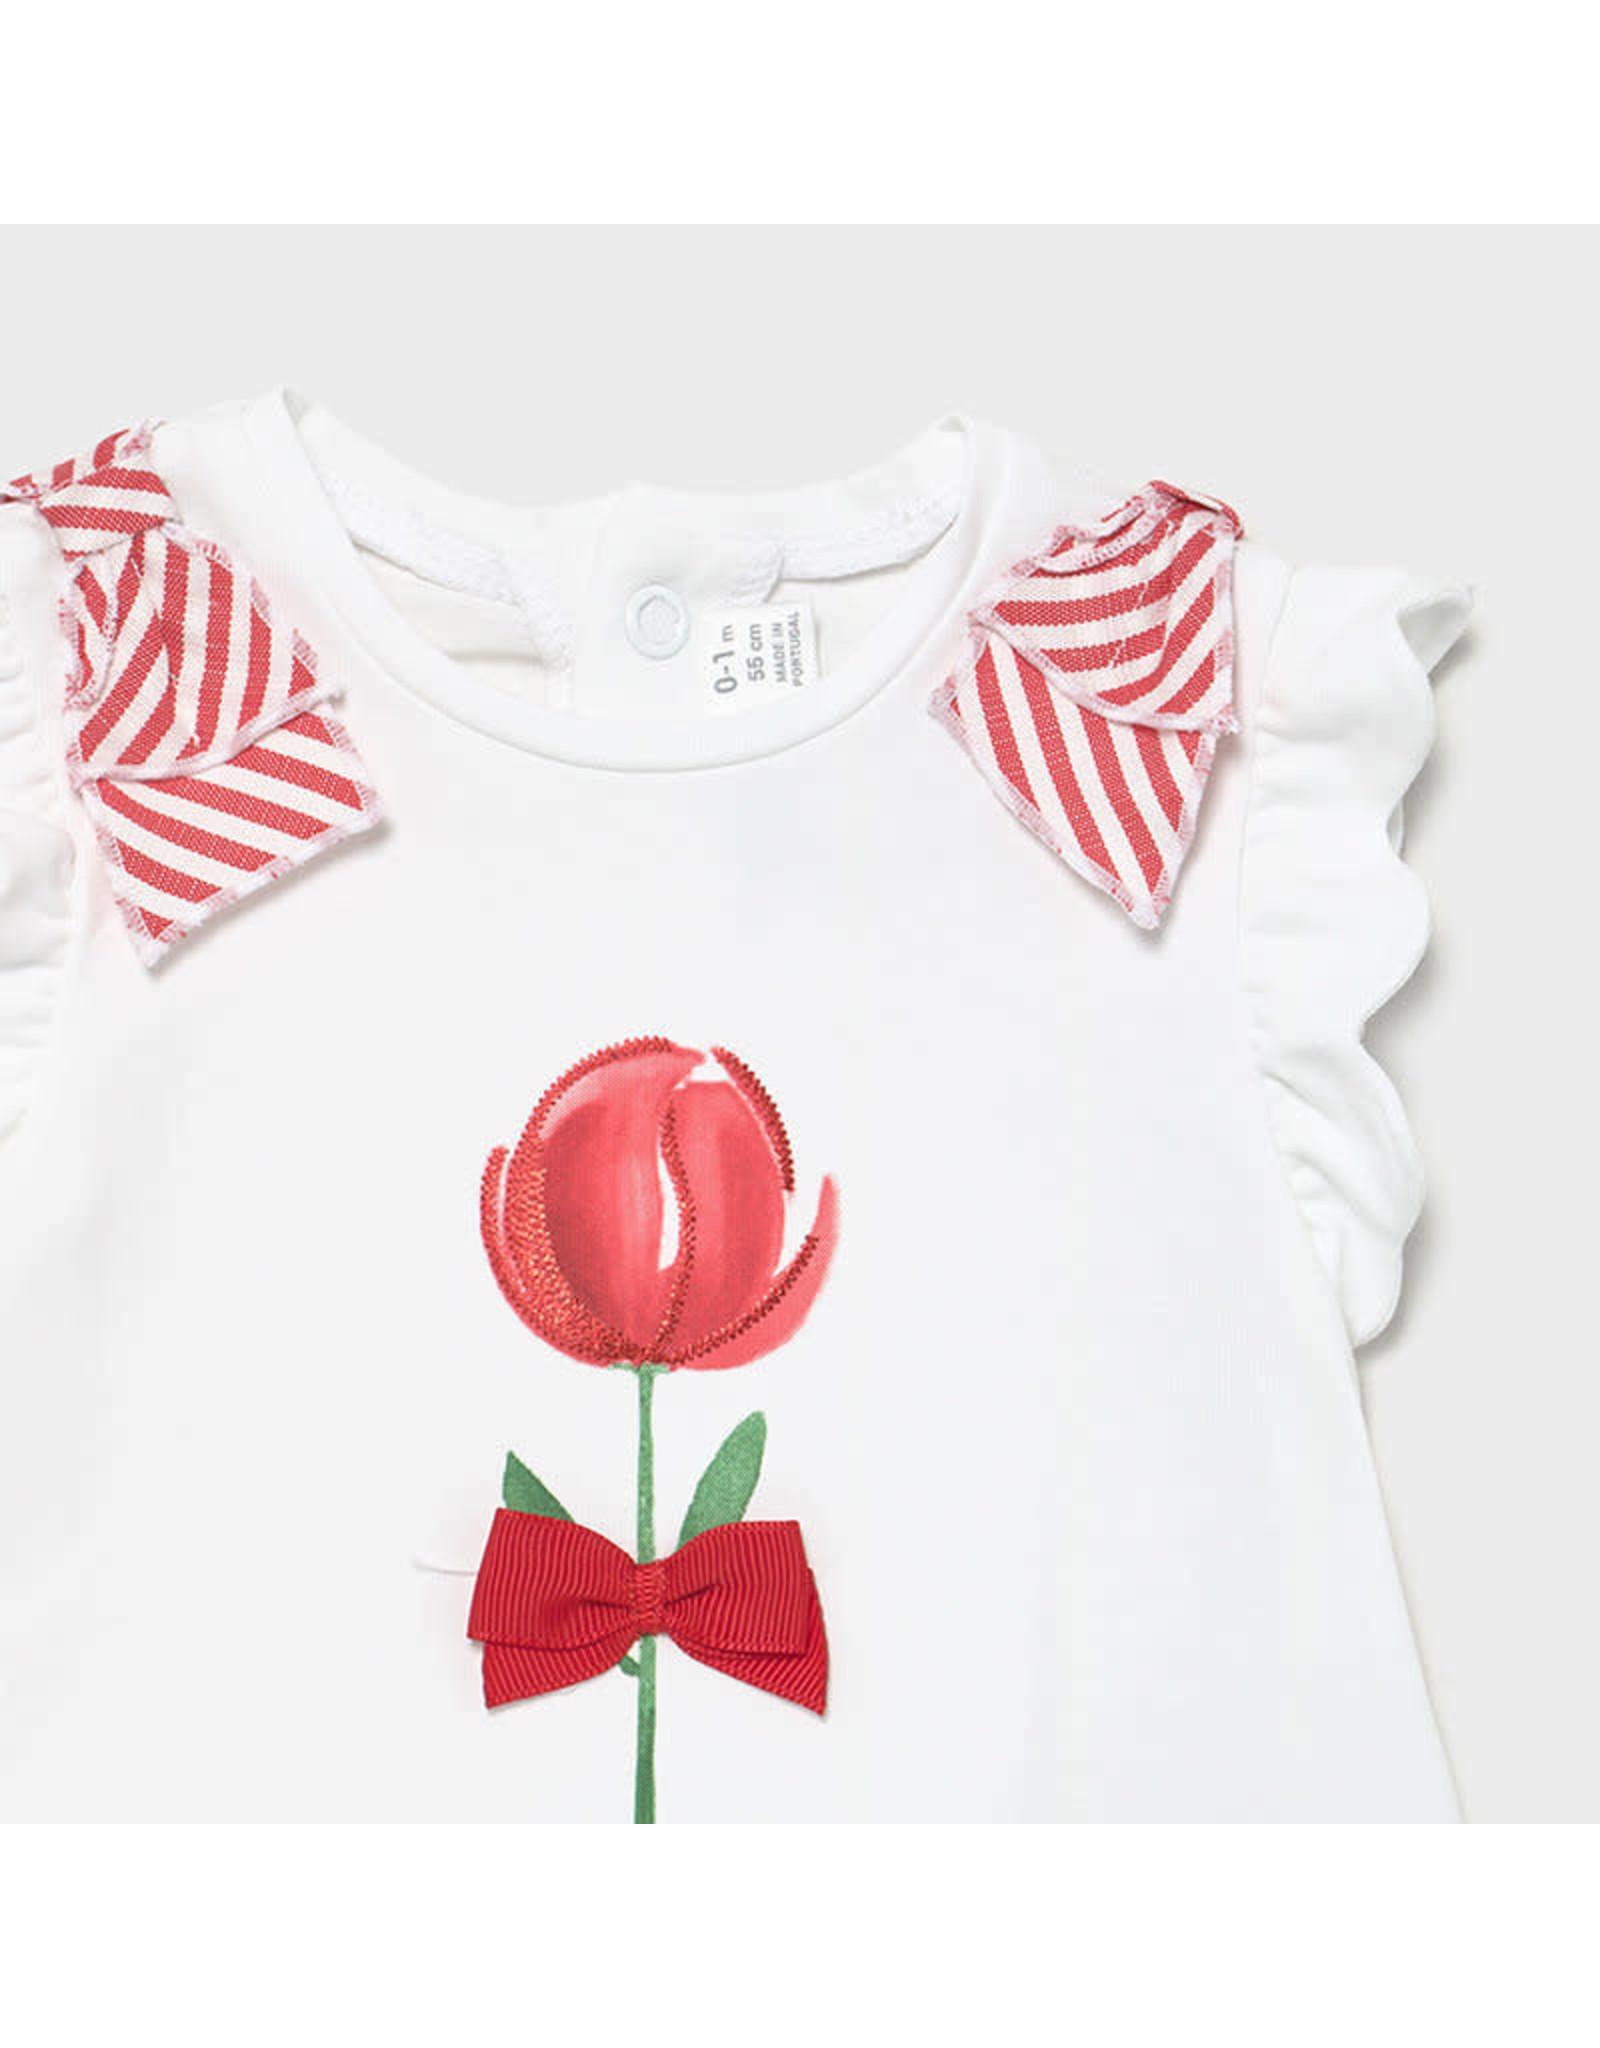 Mayoral Skirt and T-shirt set